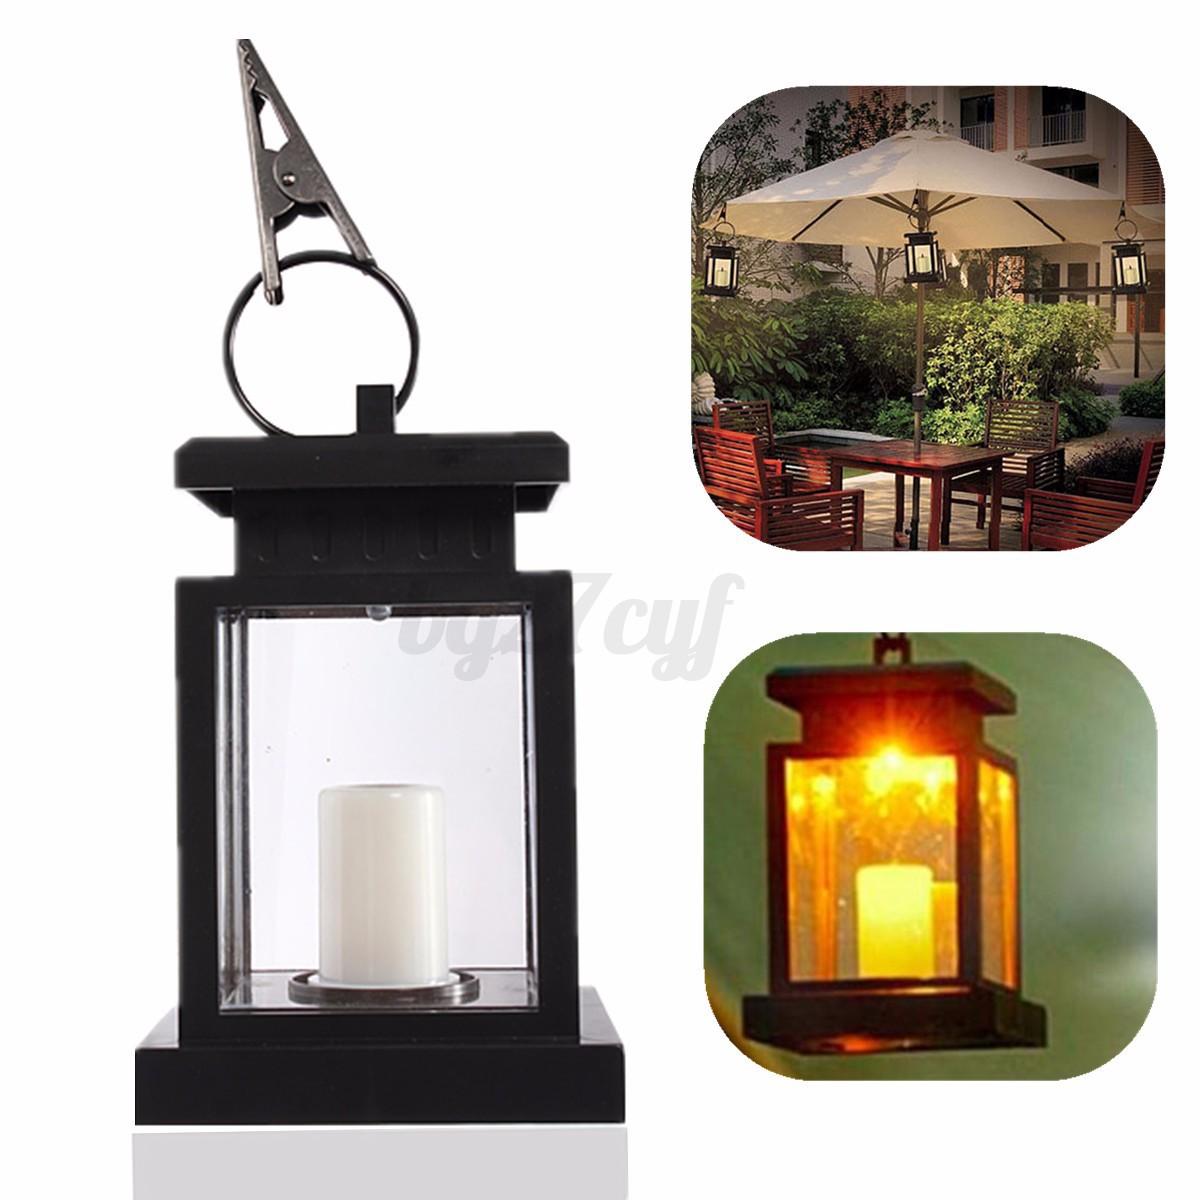 Garden Candle Wall Lights : Solar Powered Outdoor Garden Candle Light Lantern Yard Wall Landscape Lamp Clip eBay